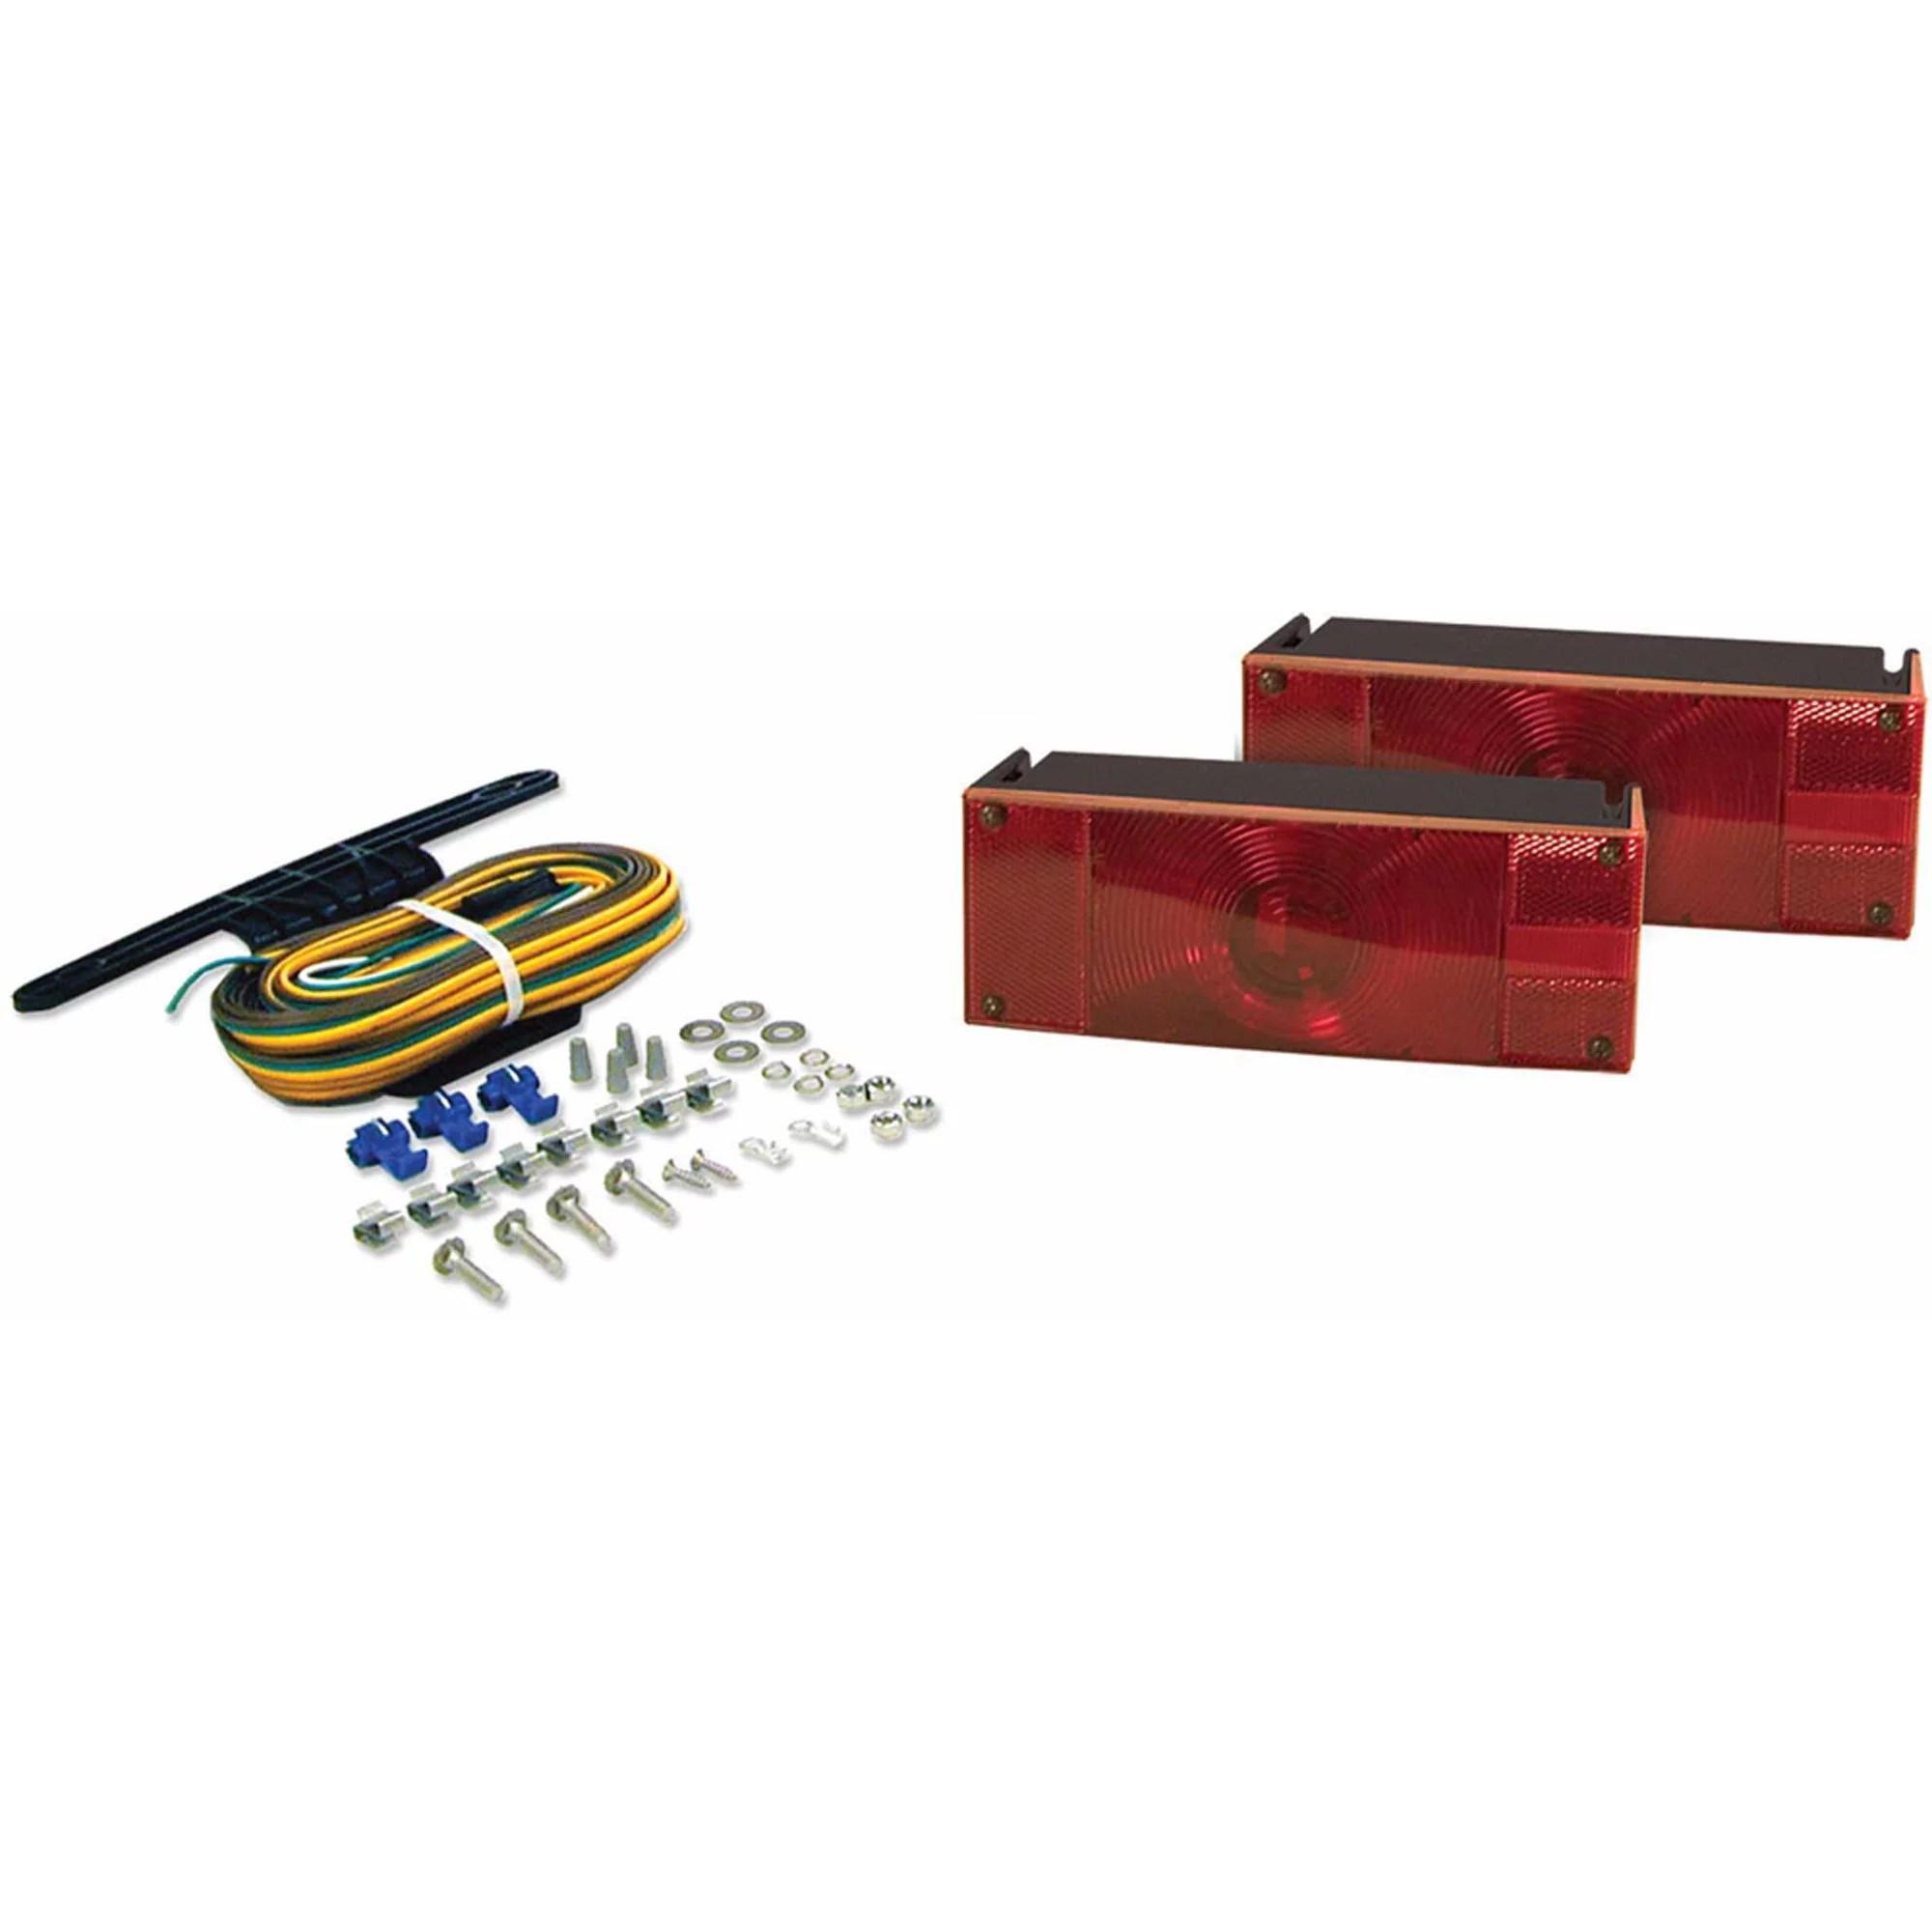 blazer international submersible low profile trailer light kit c6285 walmart com